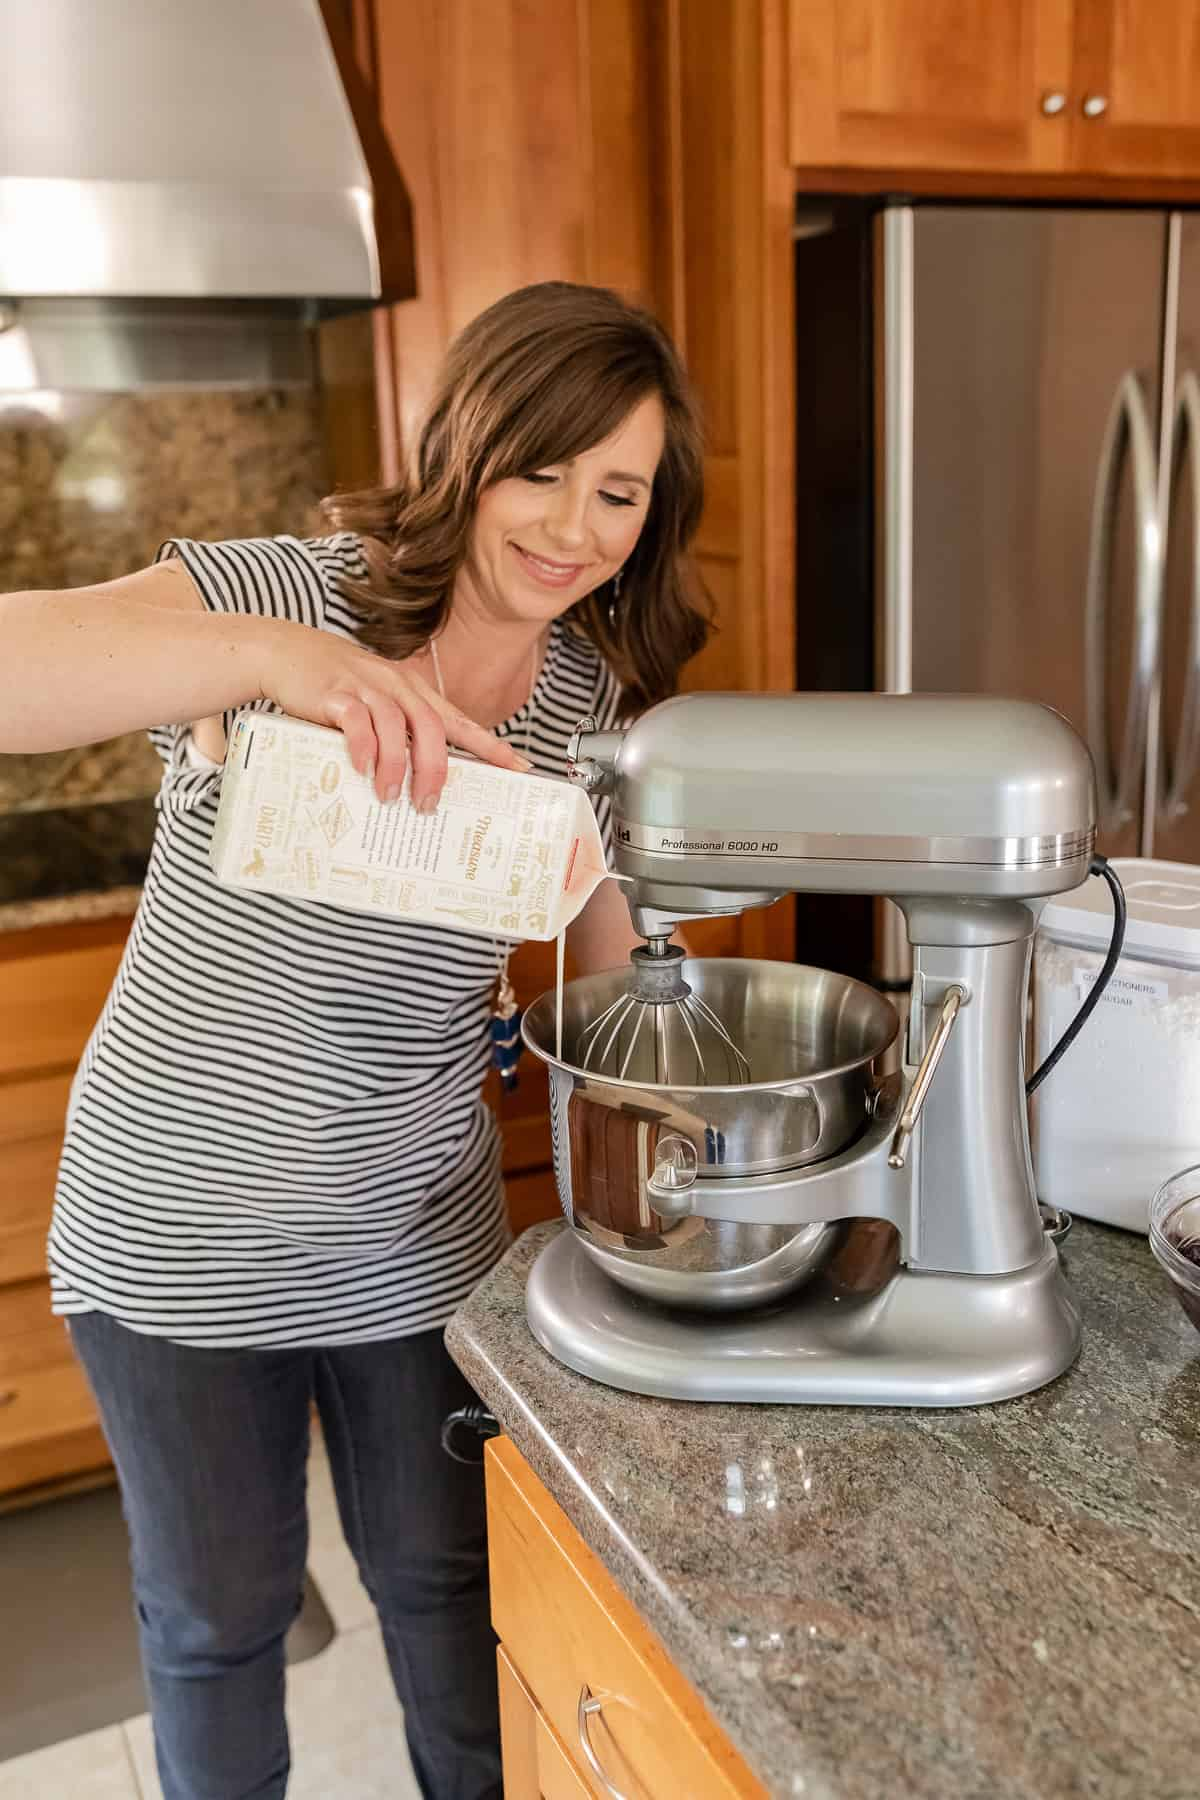 krissy allori pouring heavy cream into a stand mixer bowl